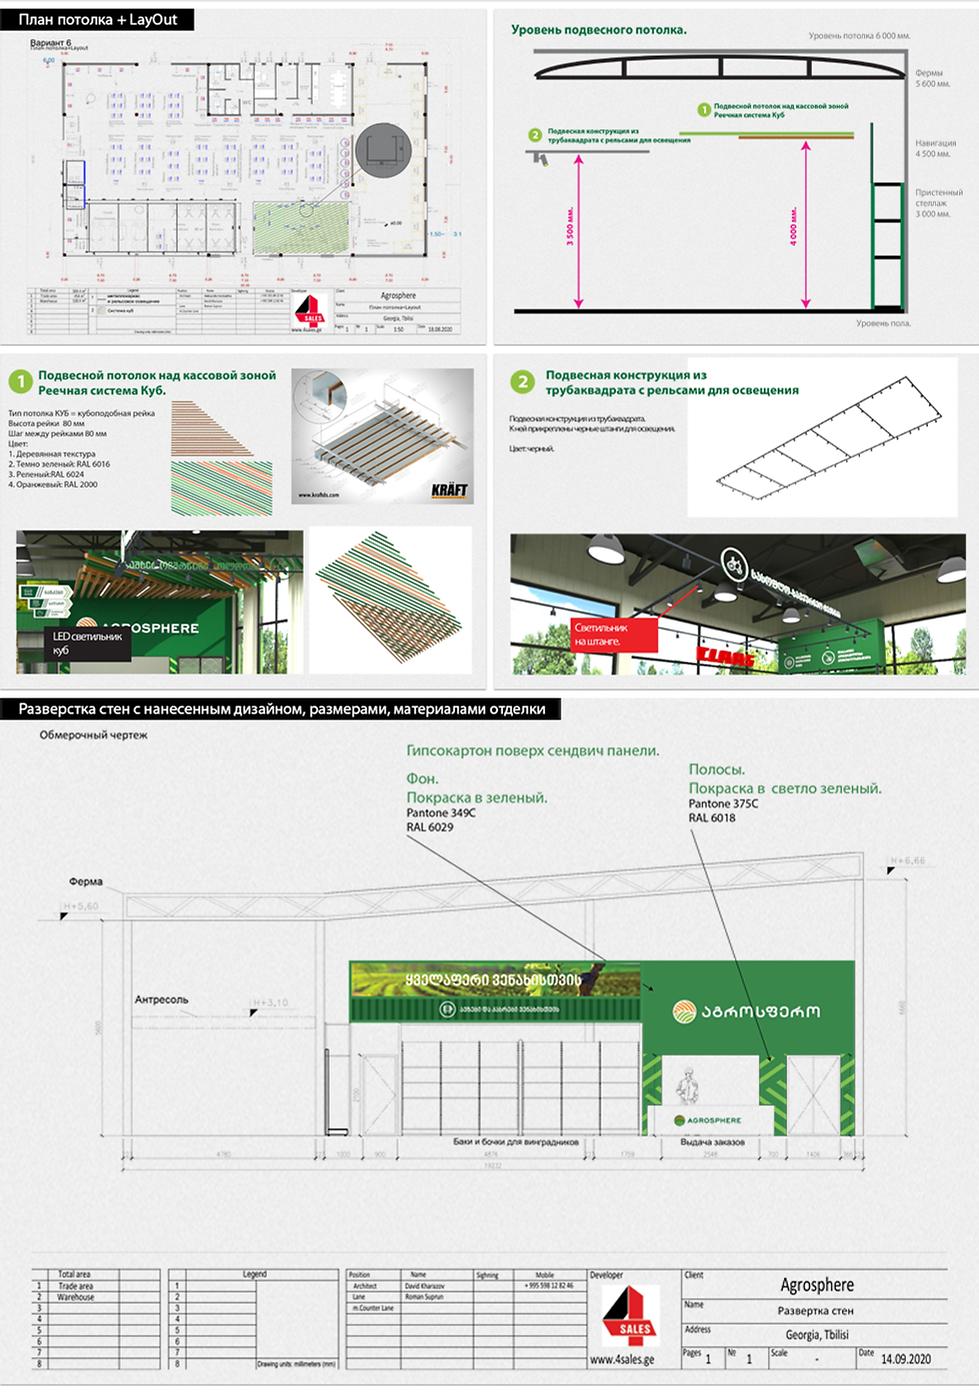 magaziis dizaini da proeqtireba 07.png